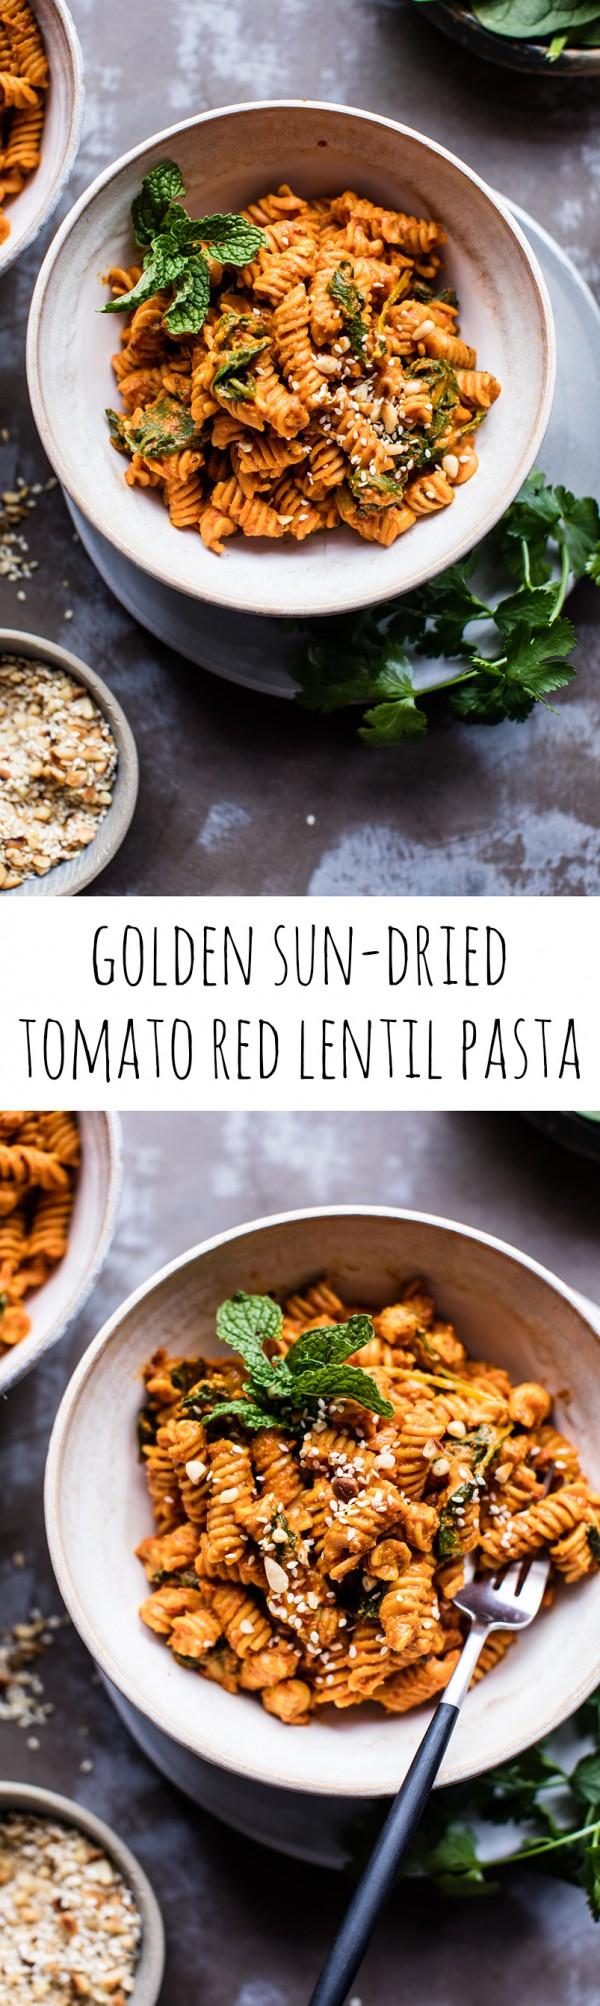 Get the recipe Sun-Dried Tomato Red Lentil Pasta @recipes_to_go